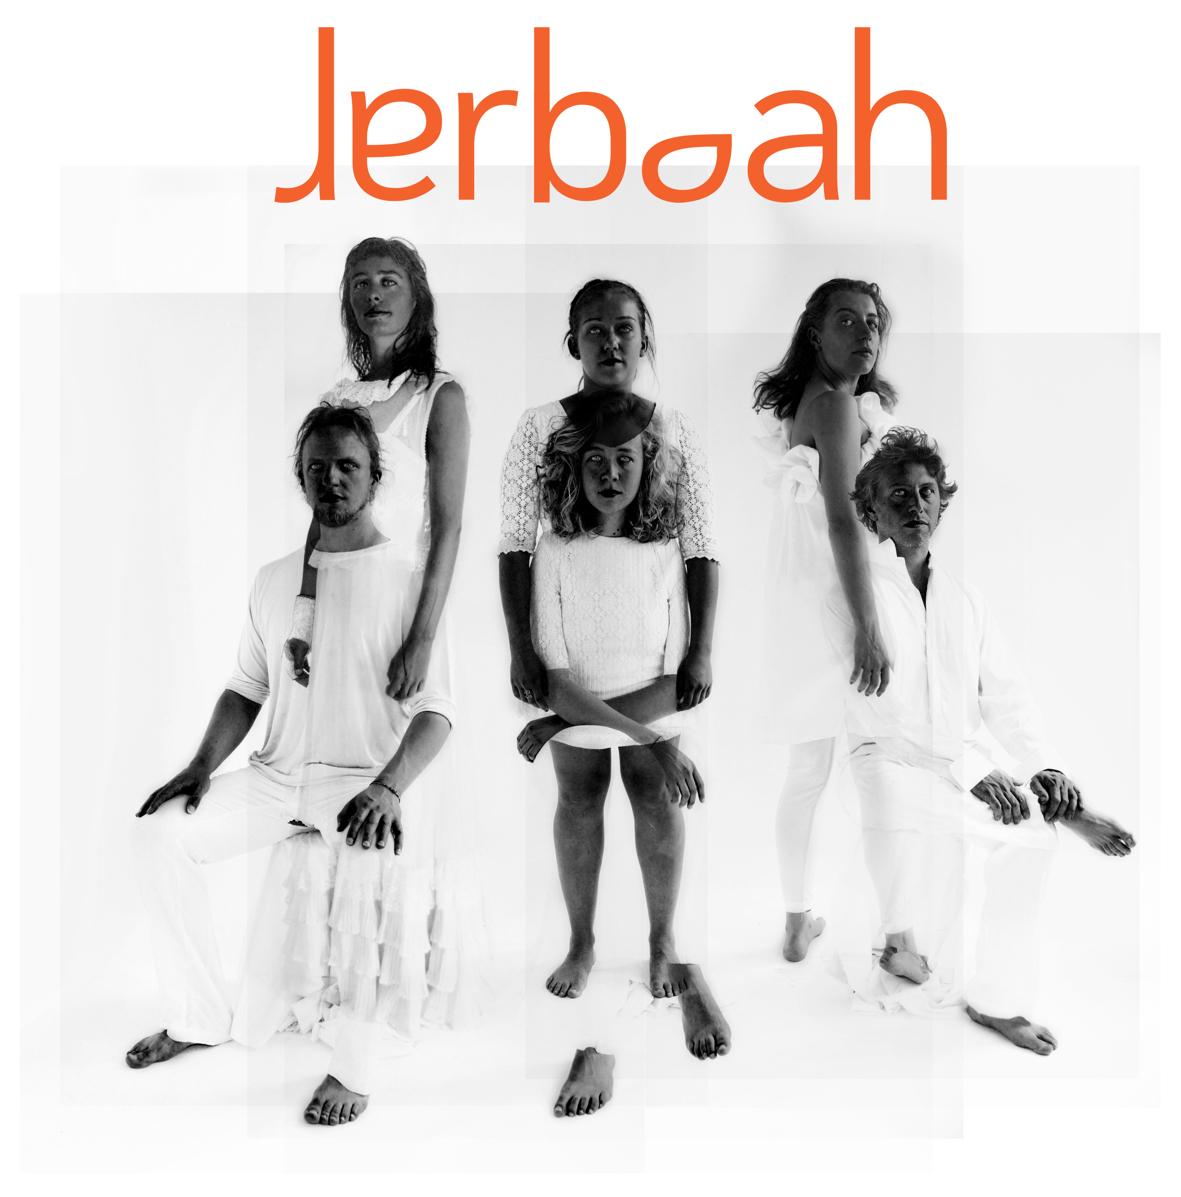 Jerboah